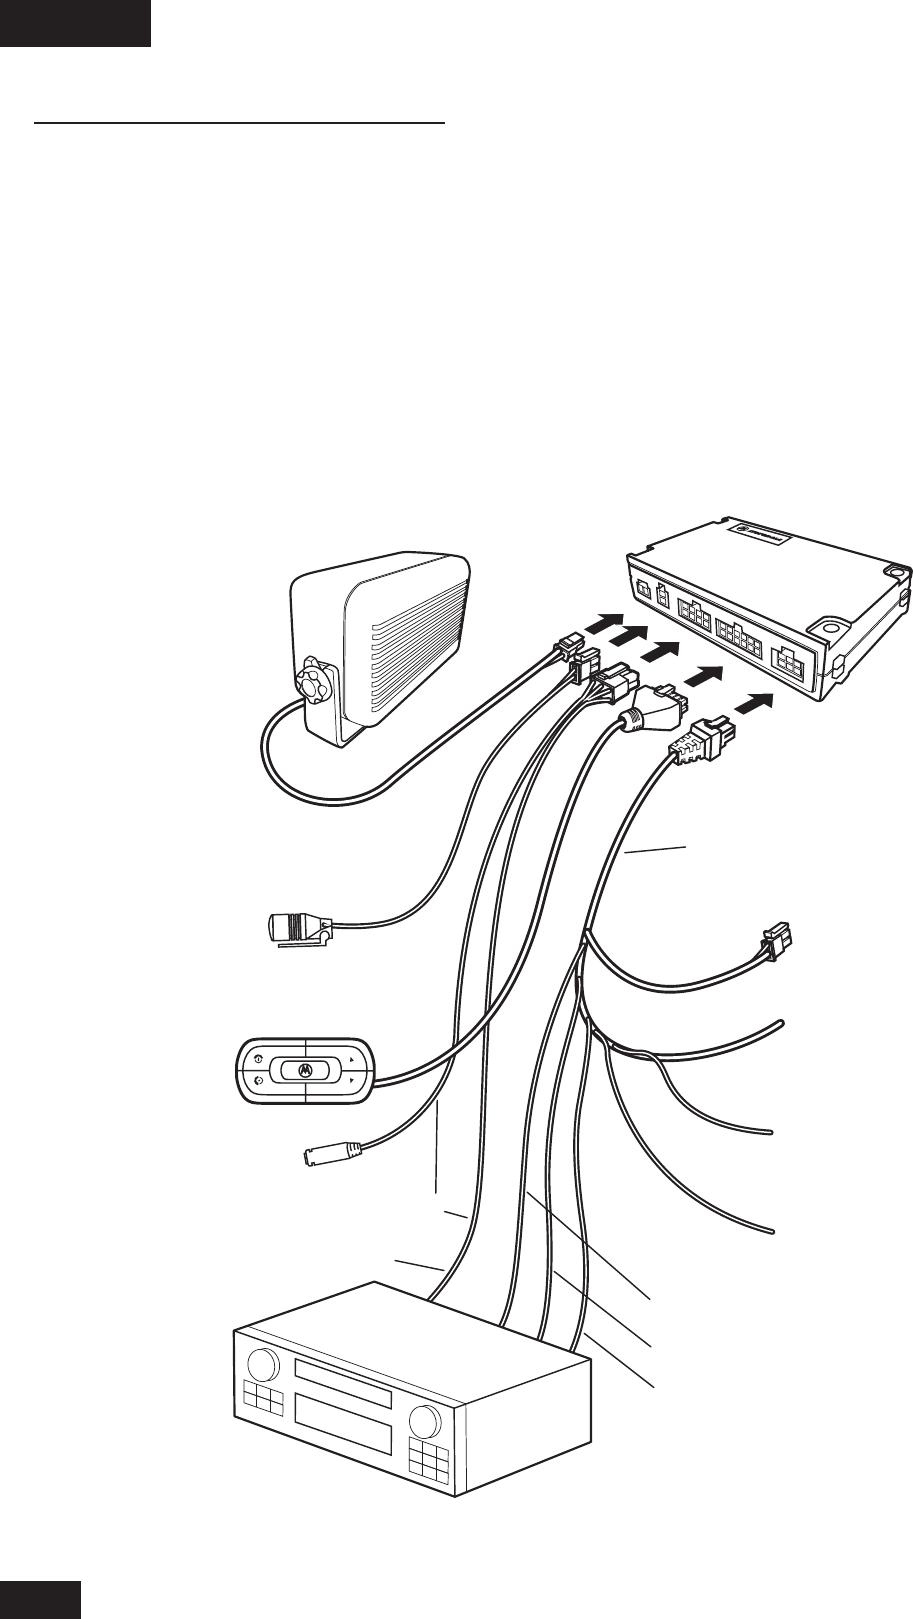 Motorola Bluetooth Car Kit T605